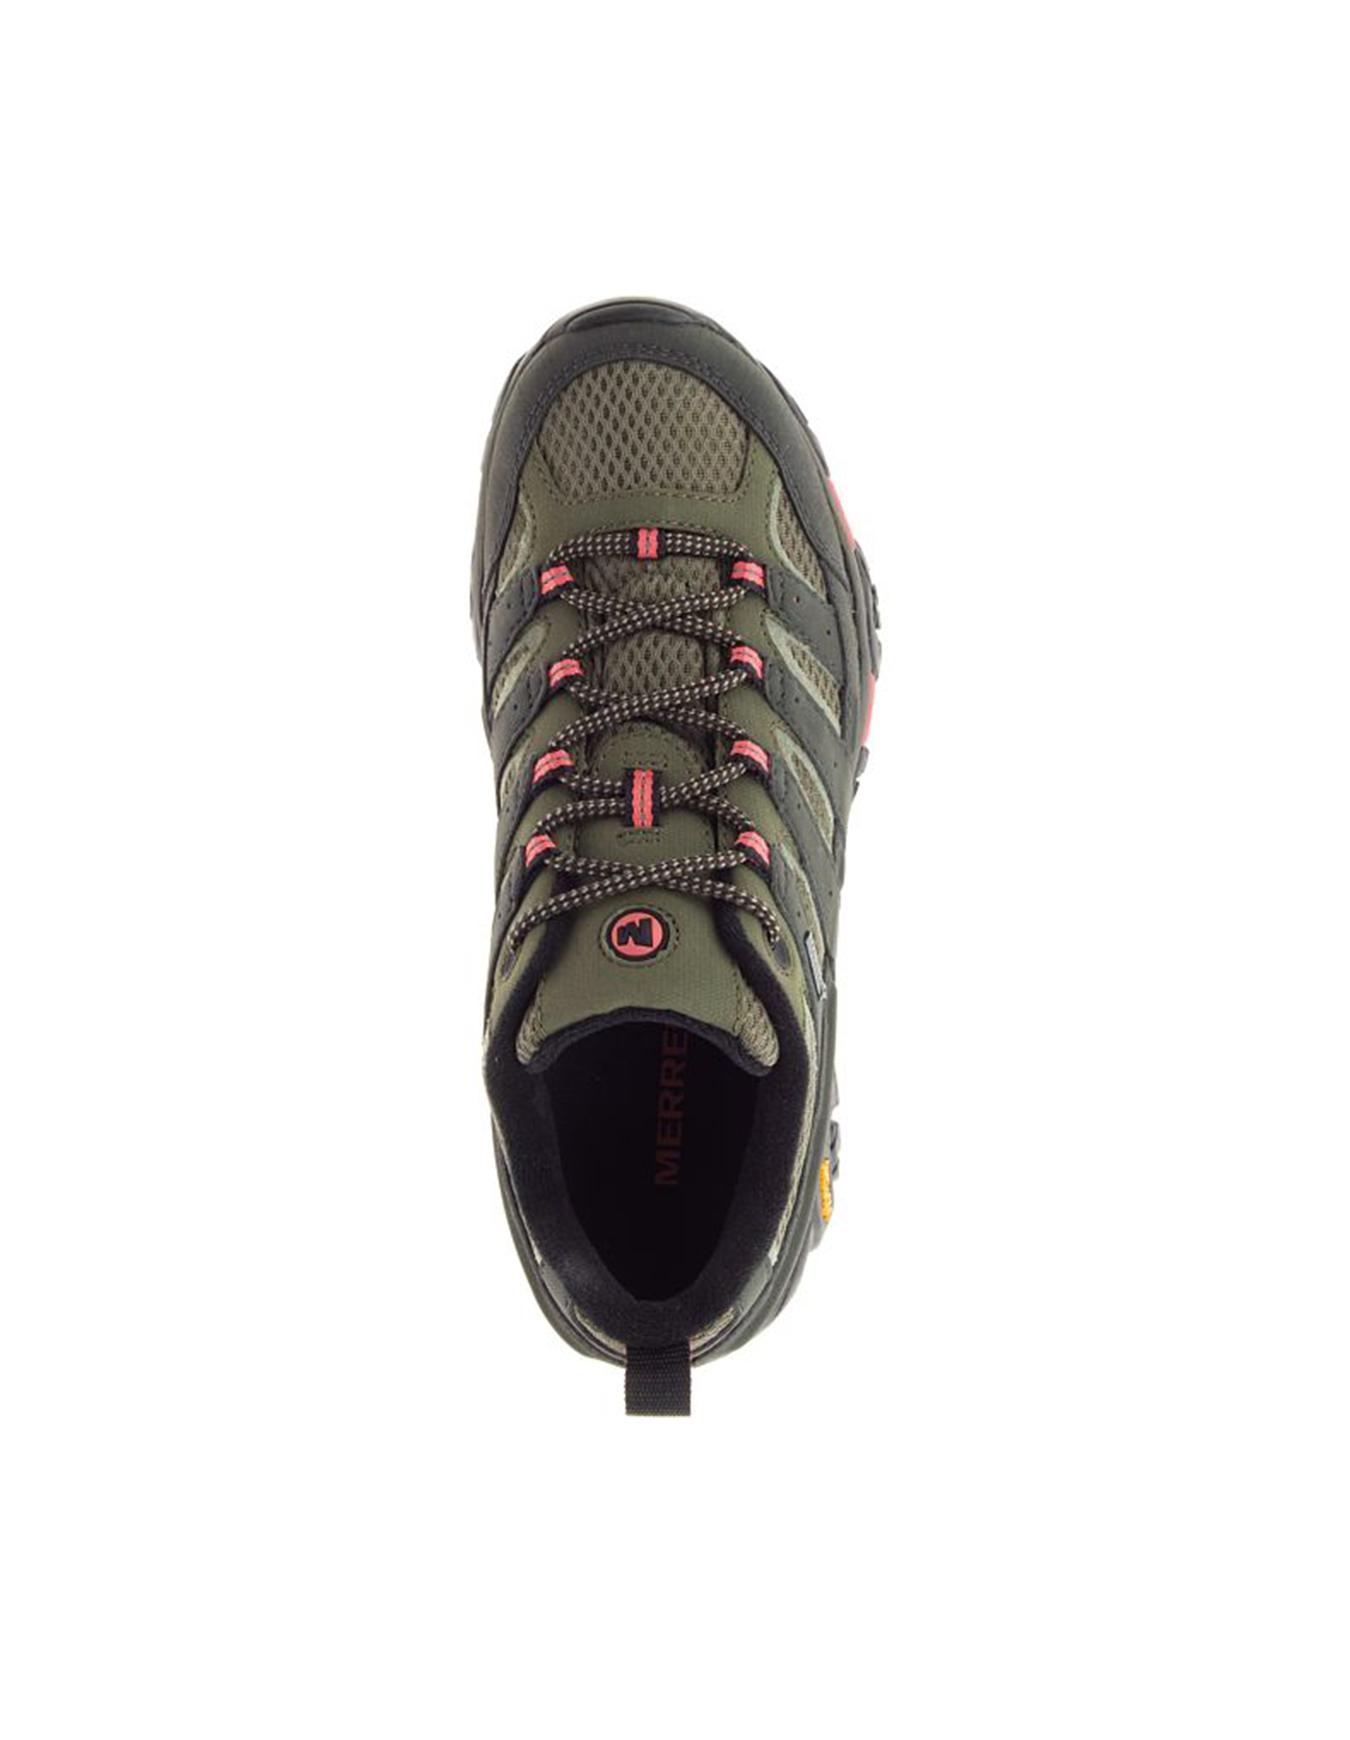 5376c647be2 Moab 2 GTX   Beluga Olive Merrell   Chaussures randonnée femme ...